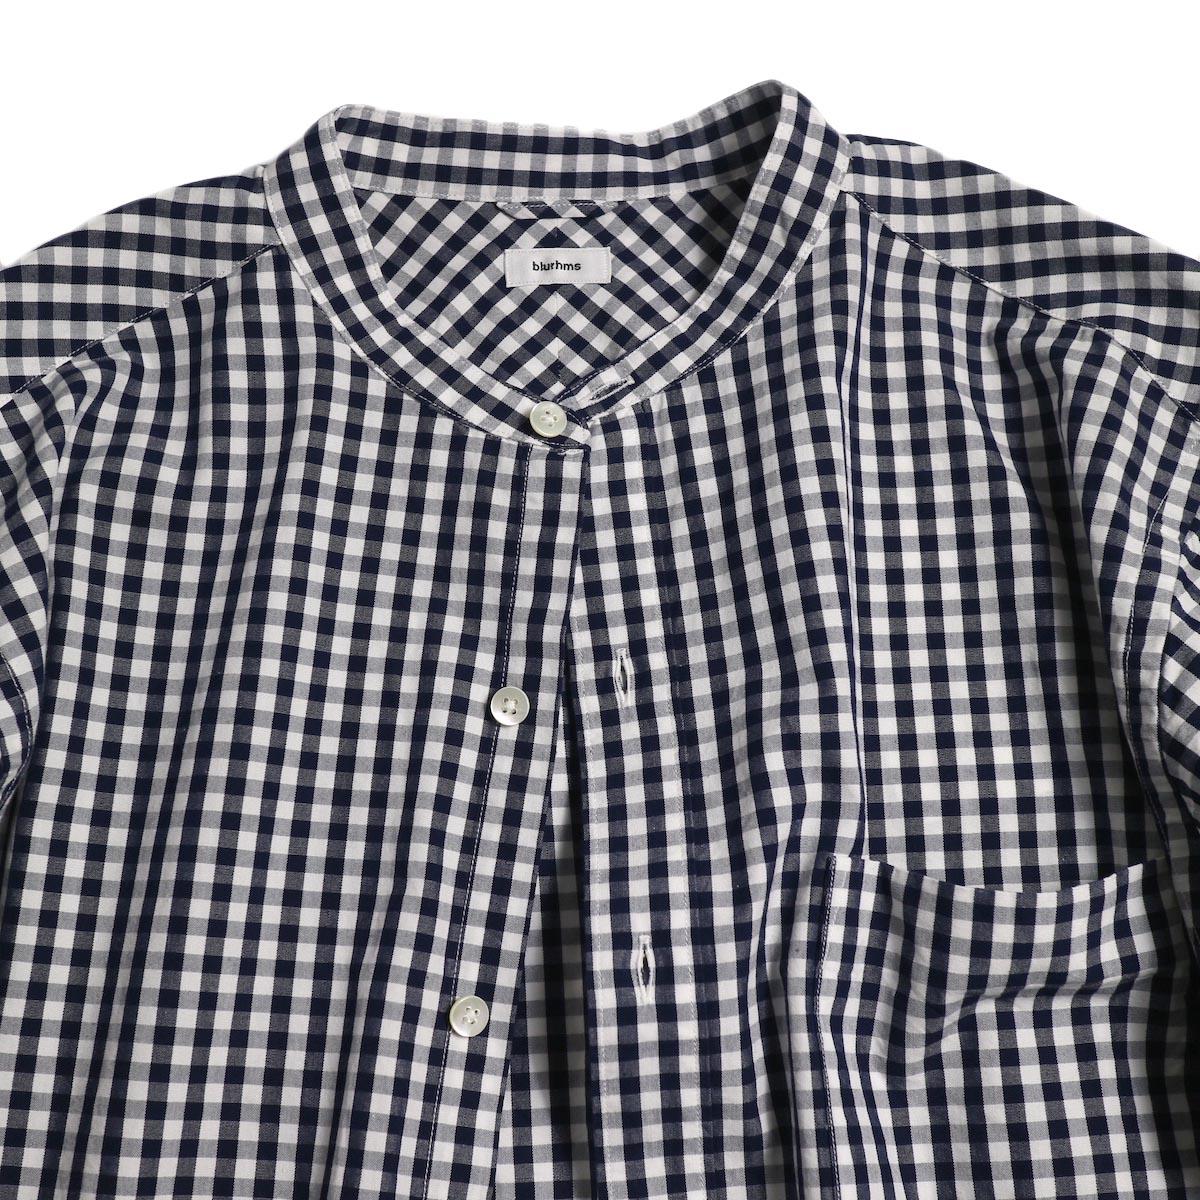 blurhms / Polish Chambray Band Collar Shirt L/S -GMCH-Navy 襟元